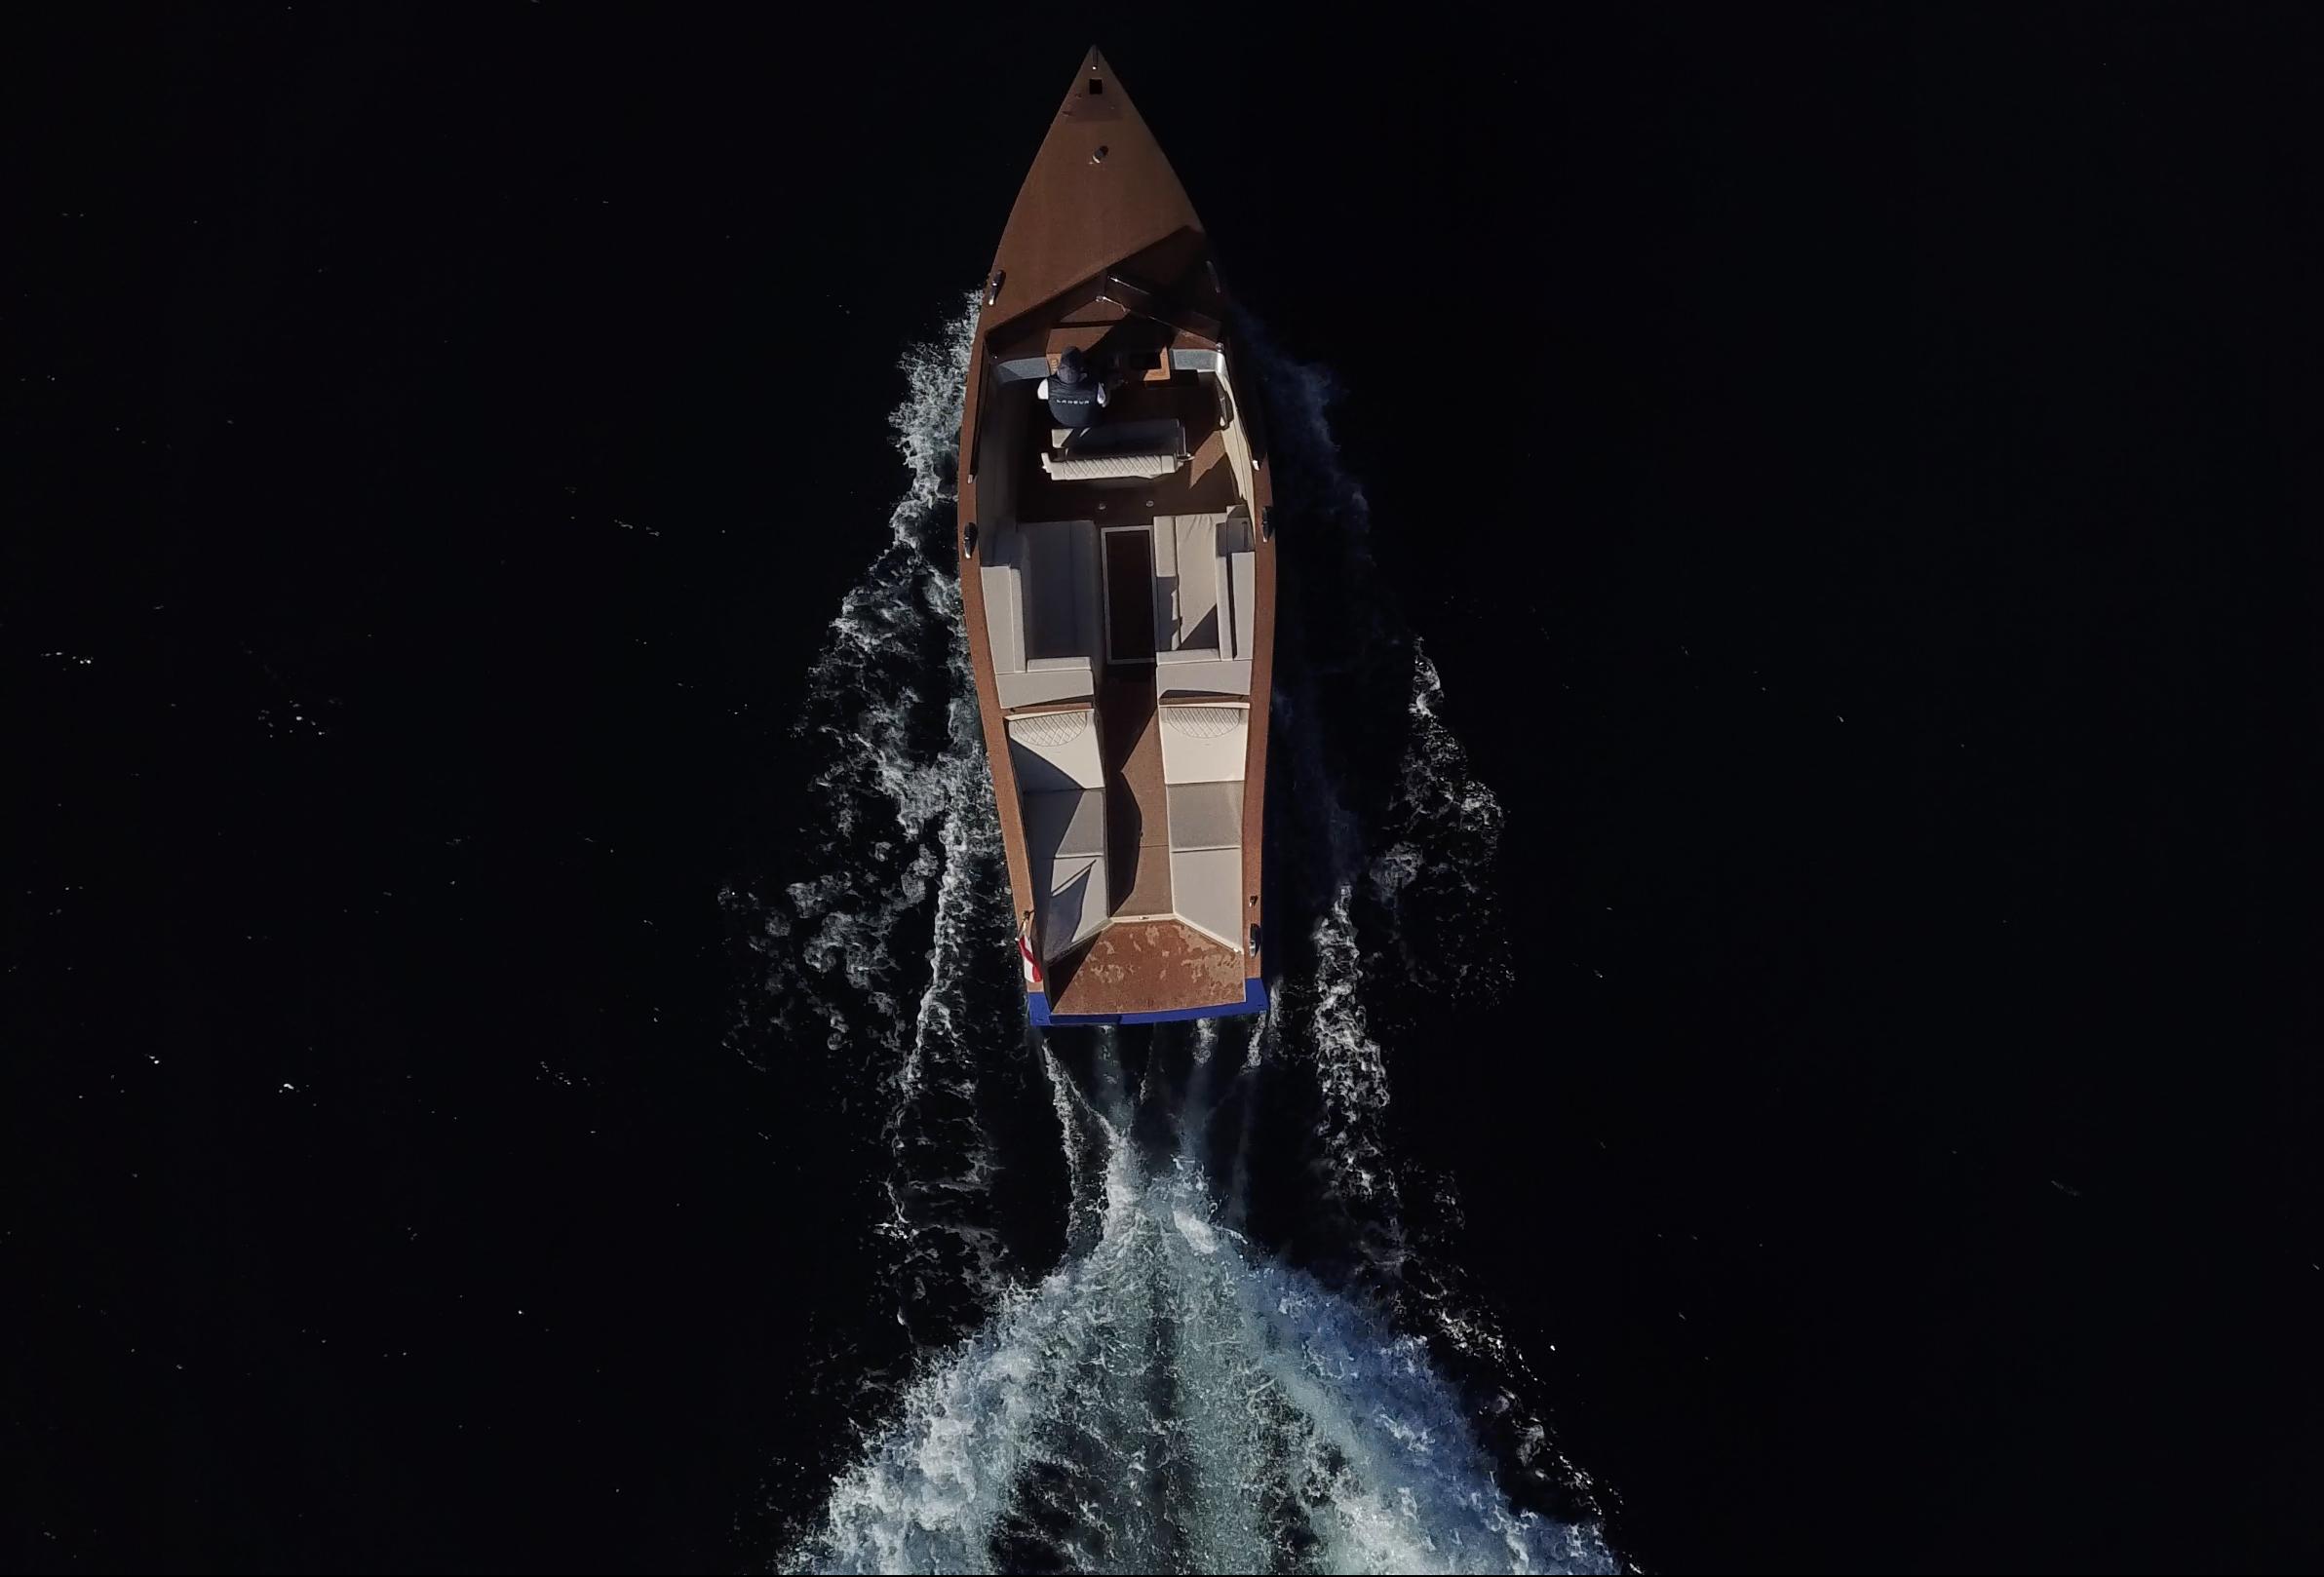 Gallery Lanéva Dayboat 3